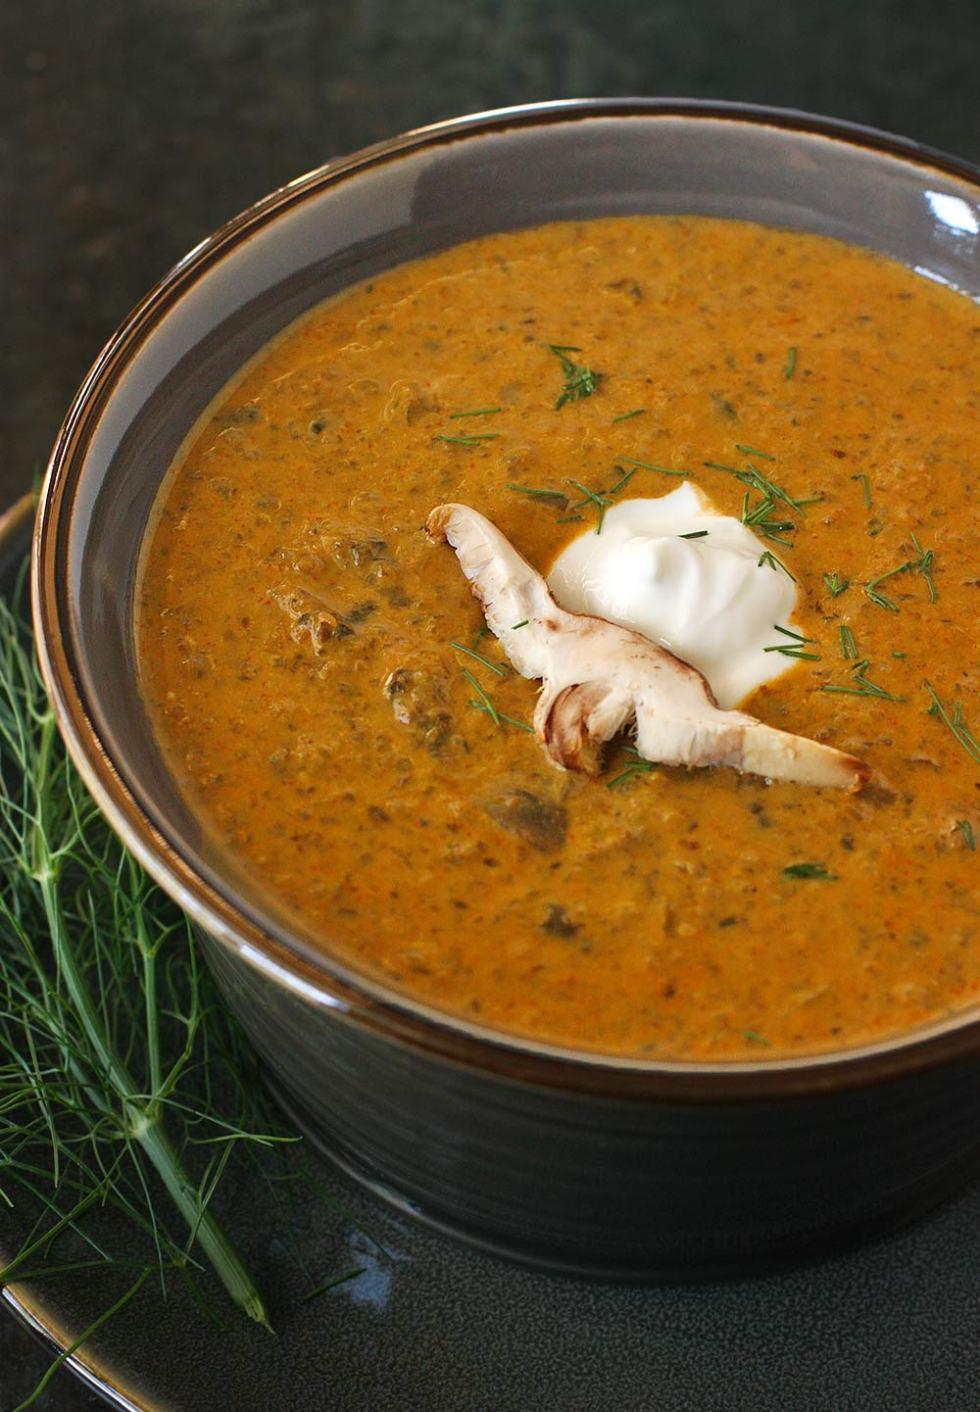 Hungarian Mushroom Soup in a bowl